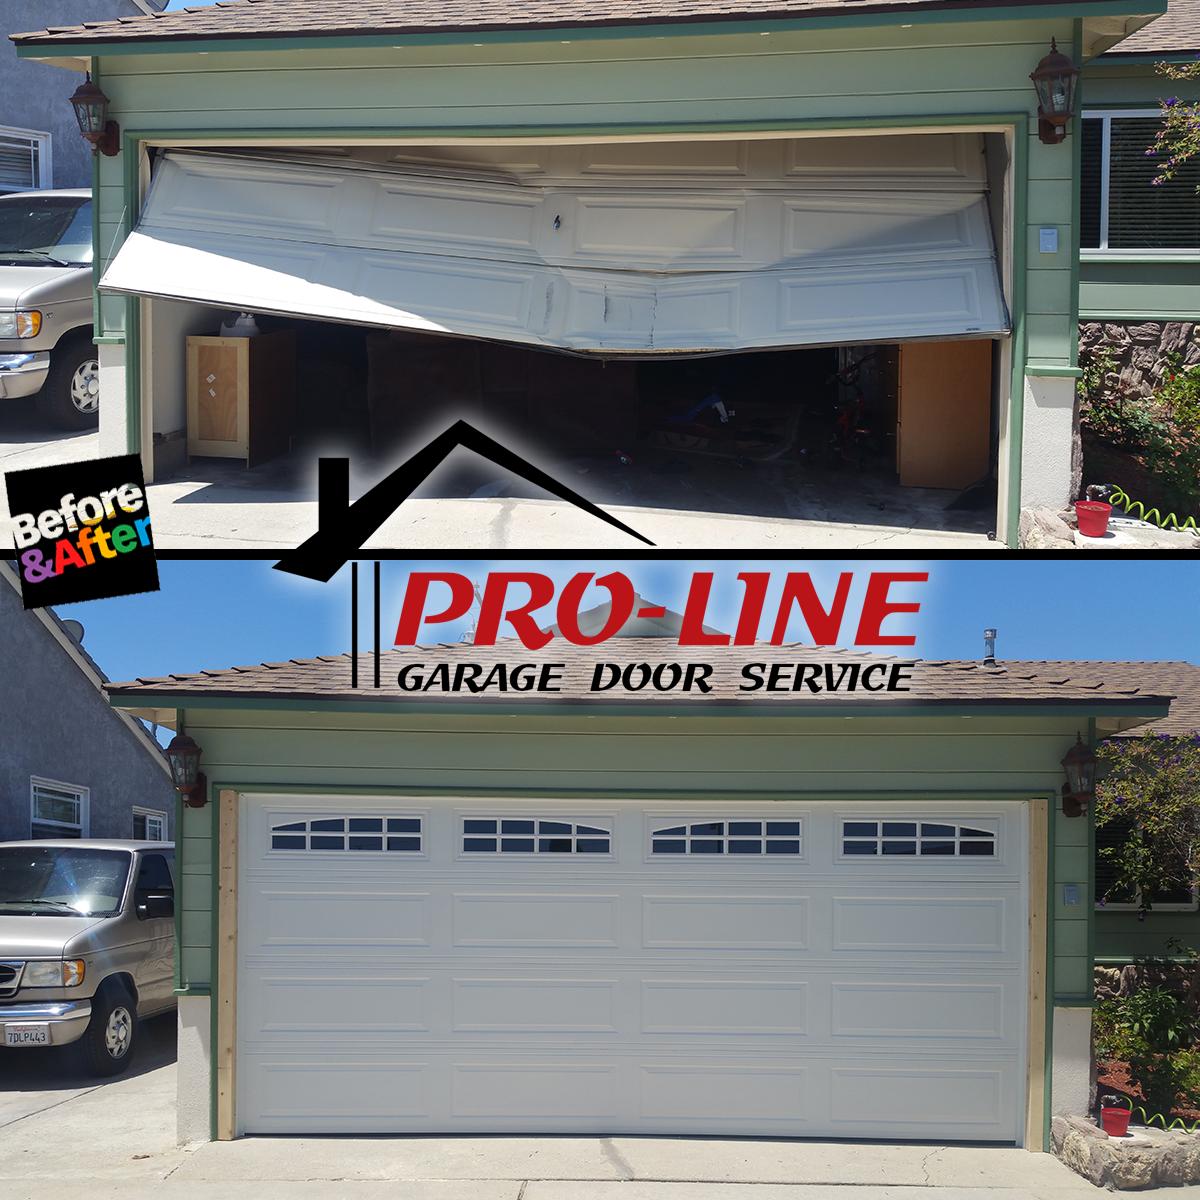 pro line garage door service in downey ca 90241. Black Bedroom Furniture Sets. Home Design Ideas